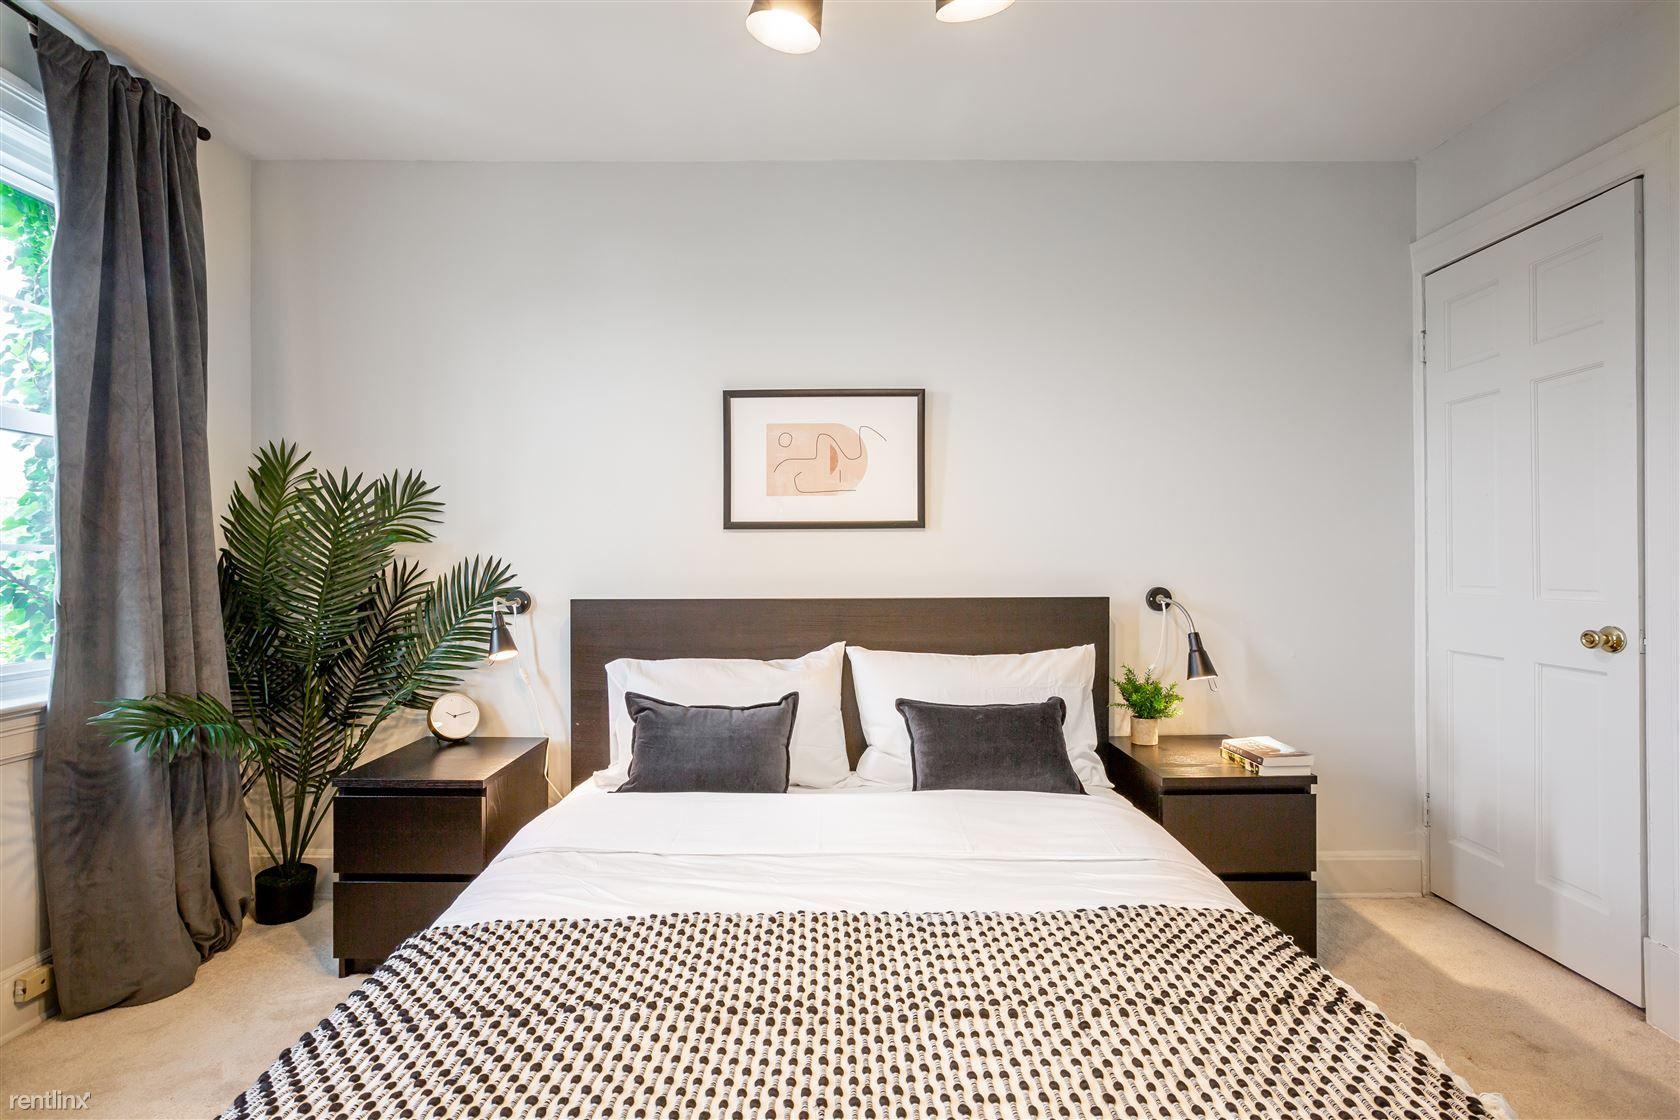 756 Fairmont St NW, Washington DC, DC, 20001 for rent